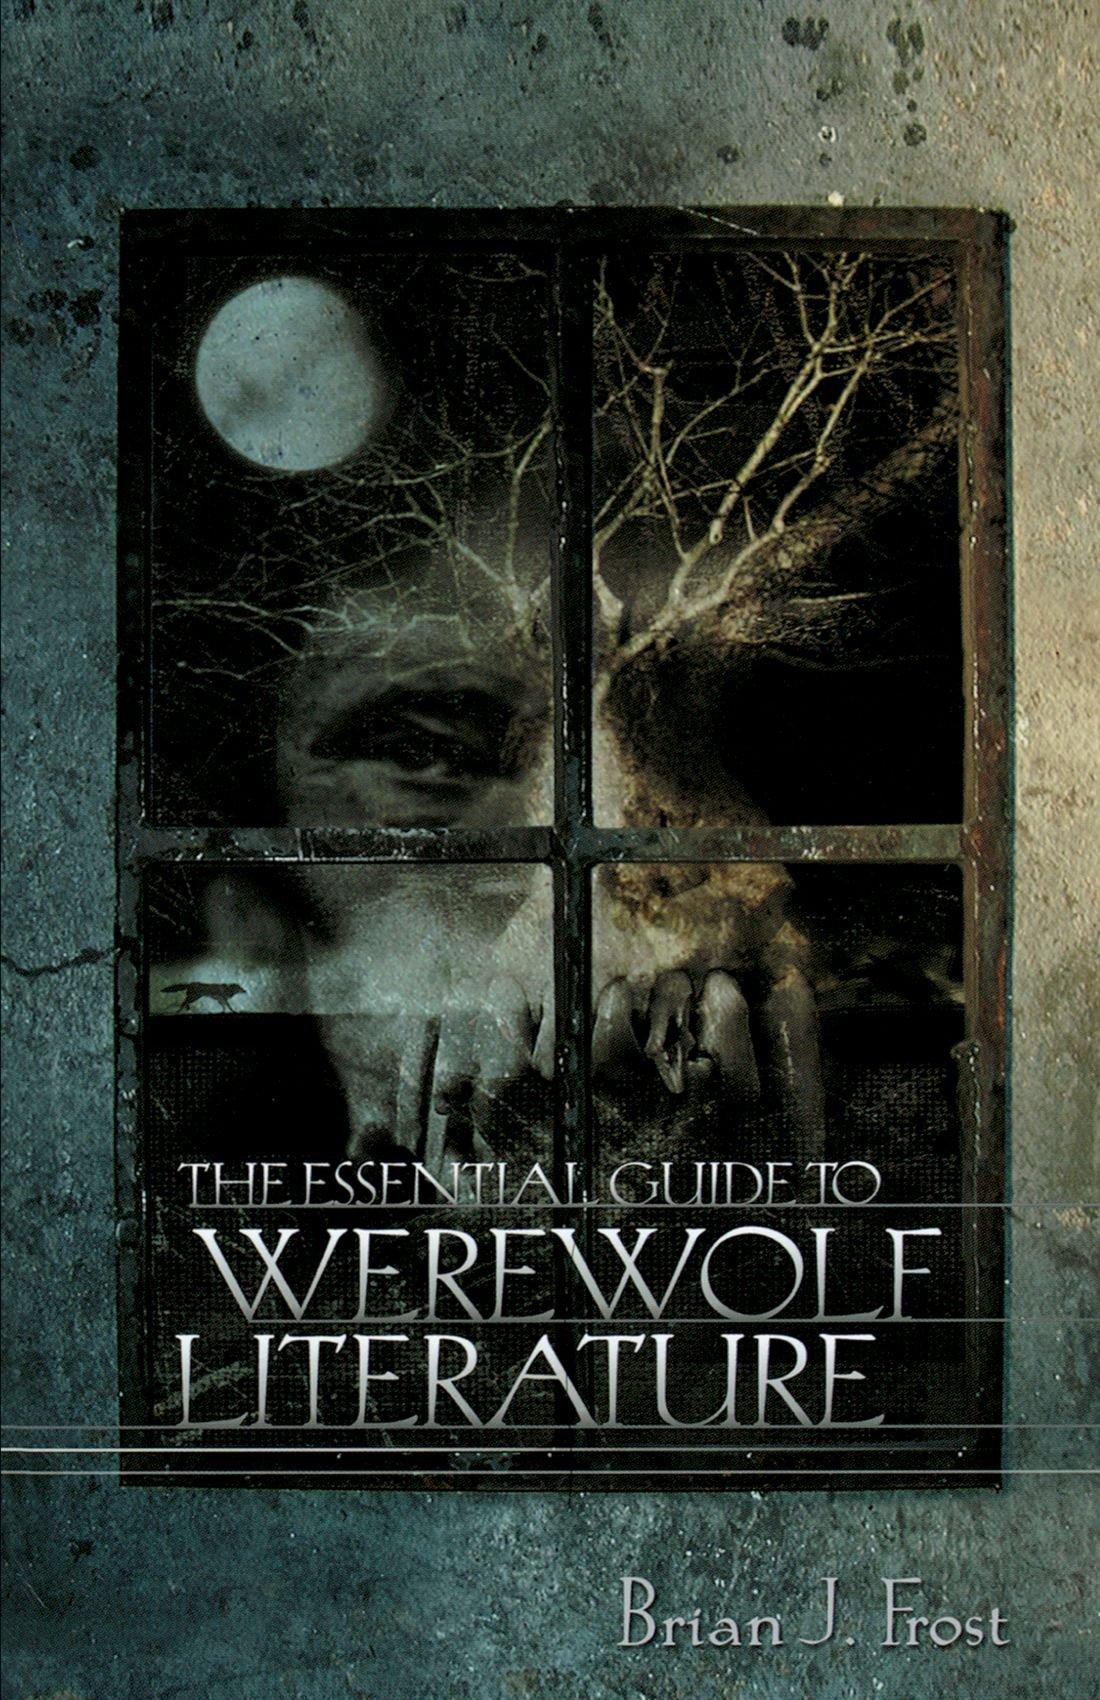 The Essential Guide to Werewolf Literature: Brian J. Frost: 9780879728601:  Books - Amazon.ca